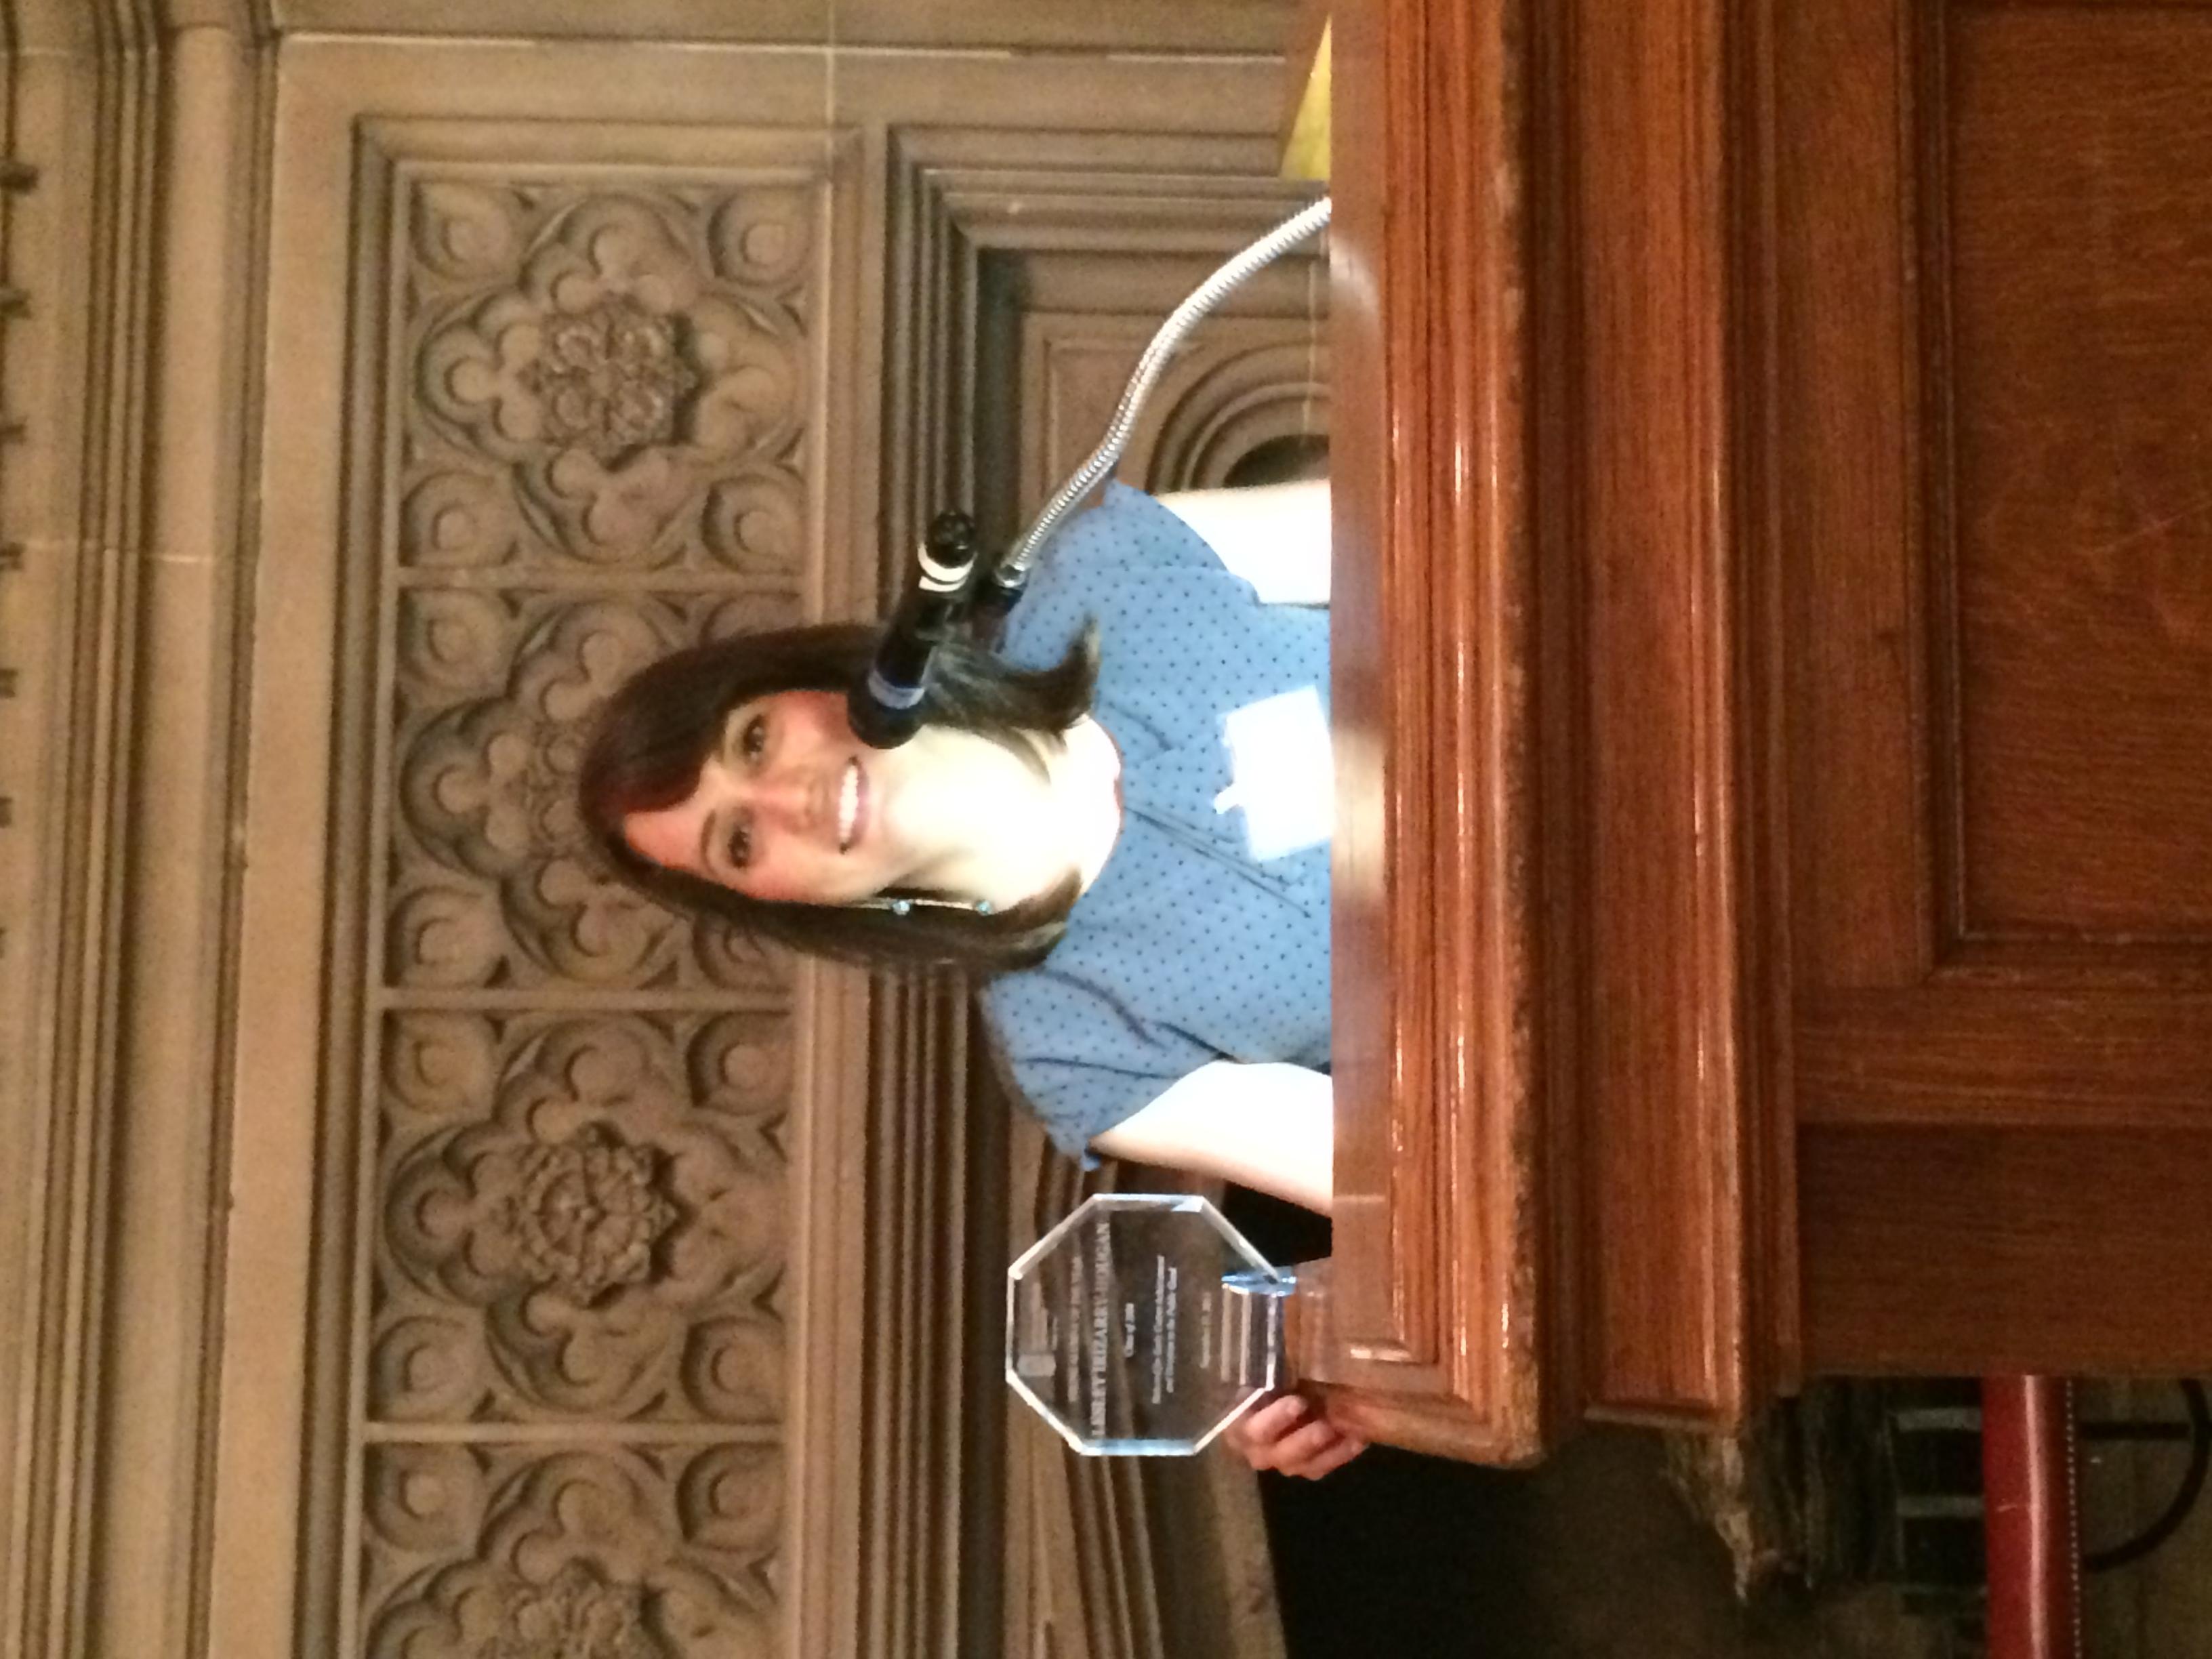 Lesley with NIU Law Award